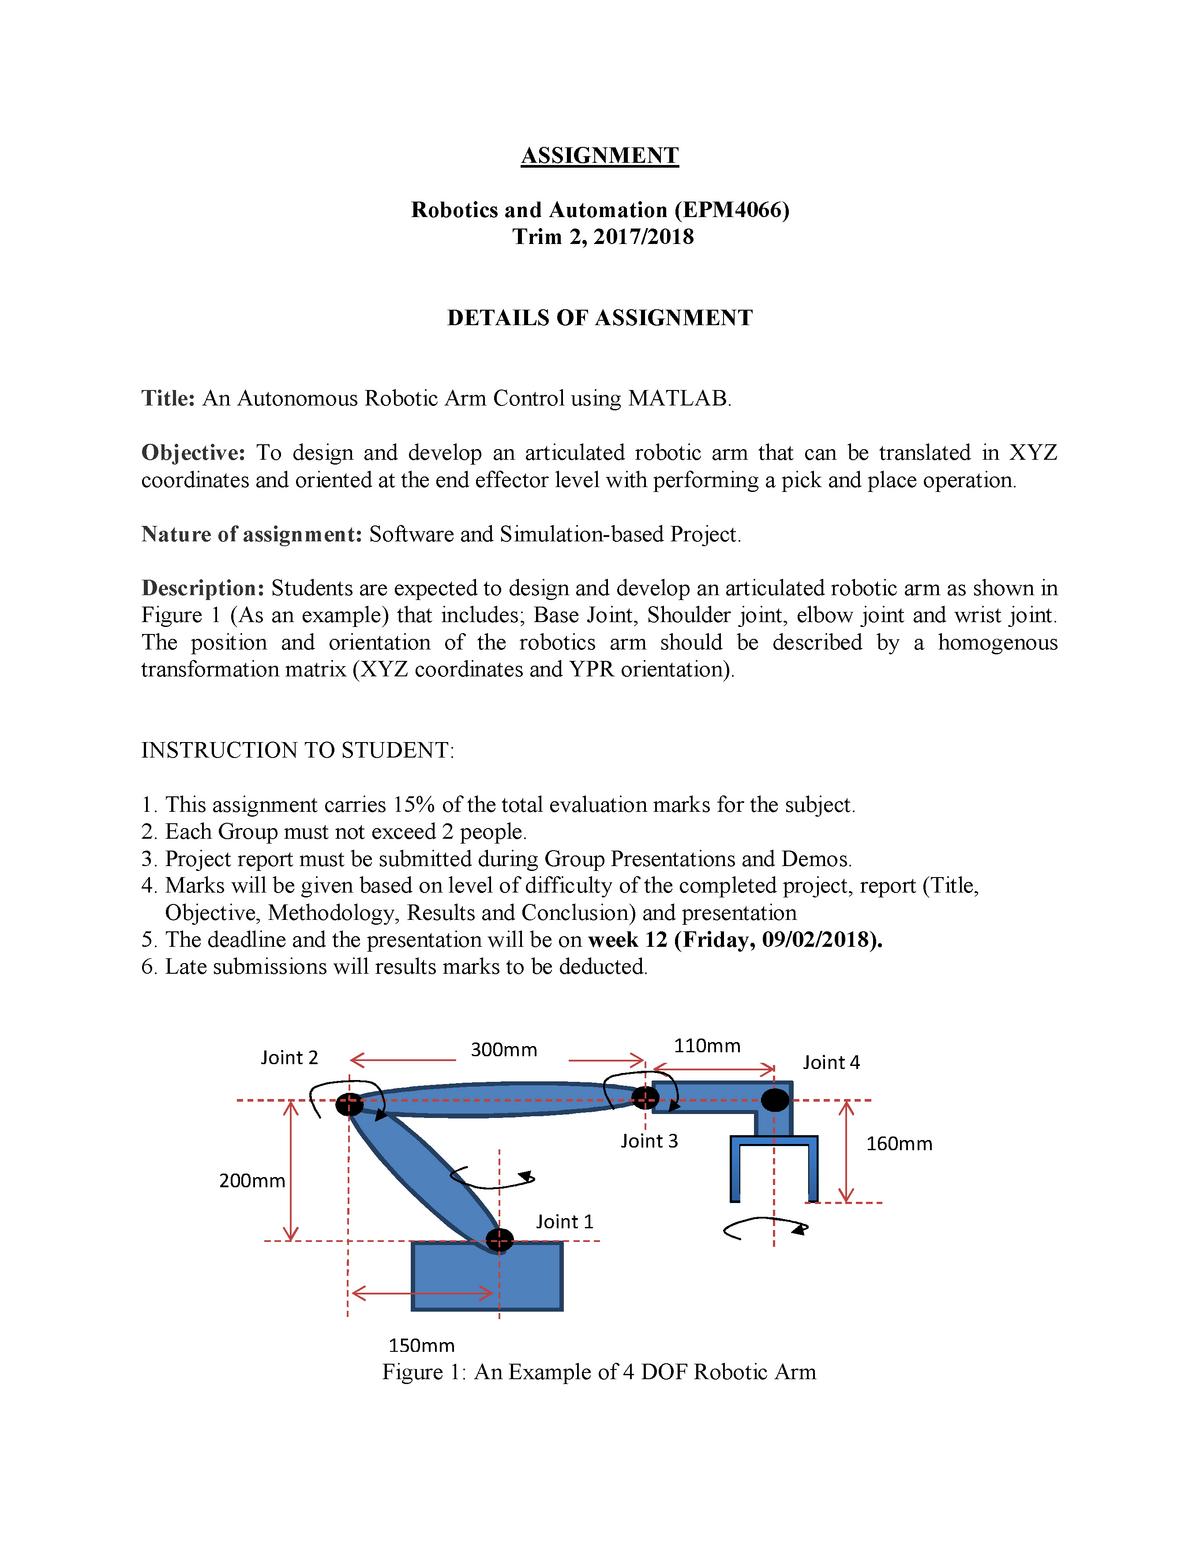 187864 Assignment Project - Robotics & automation - StuDocu